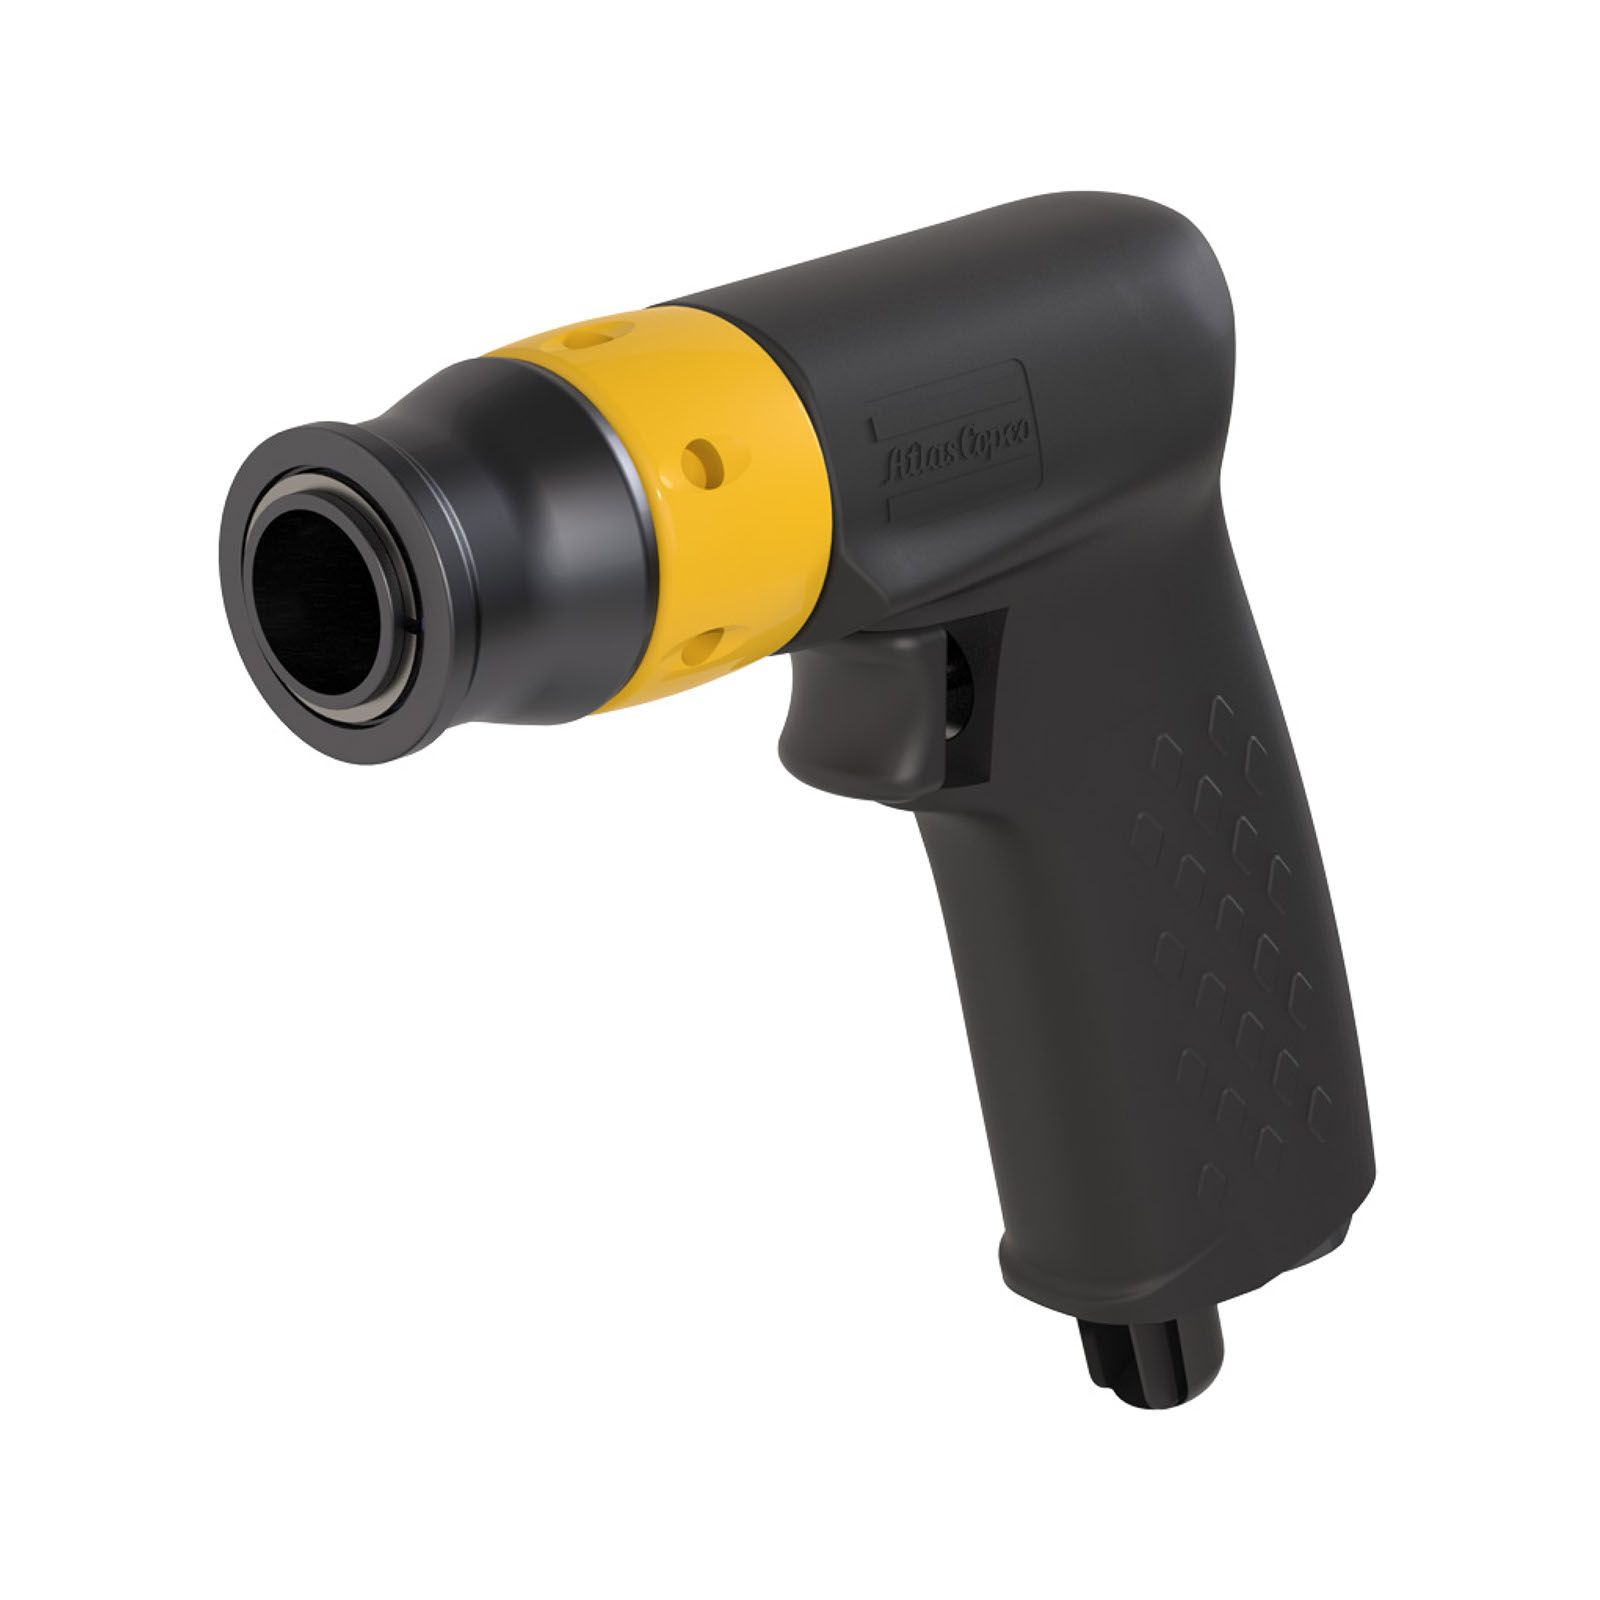 Pistol Modular Pneumatic Drill LBP product photo